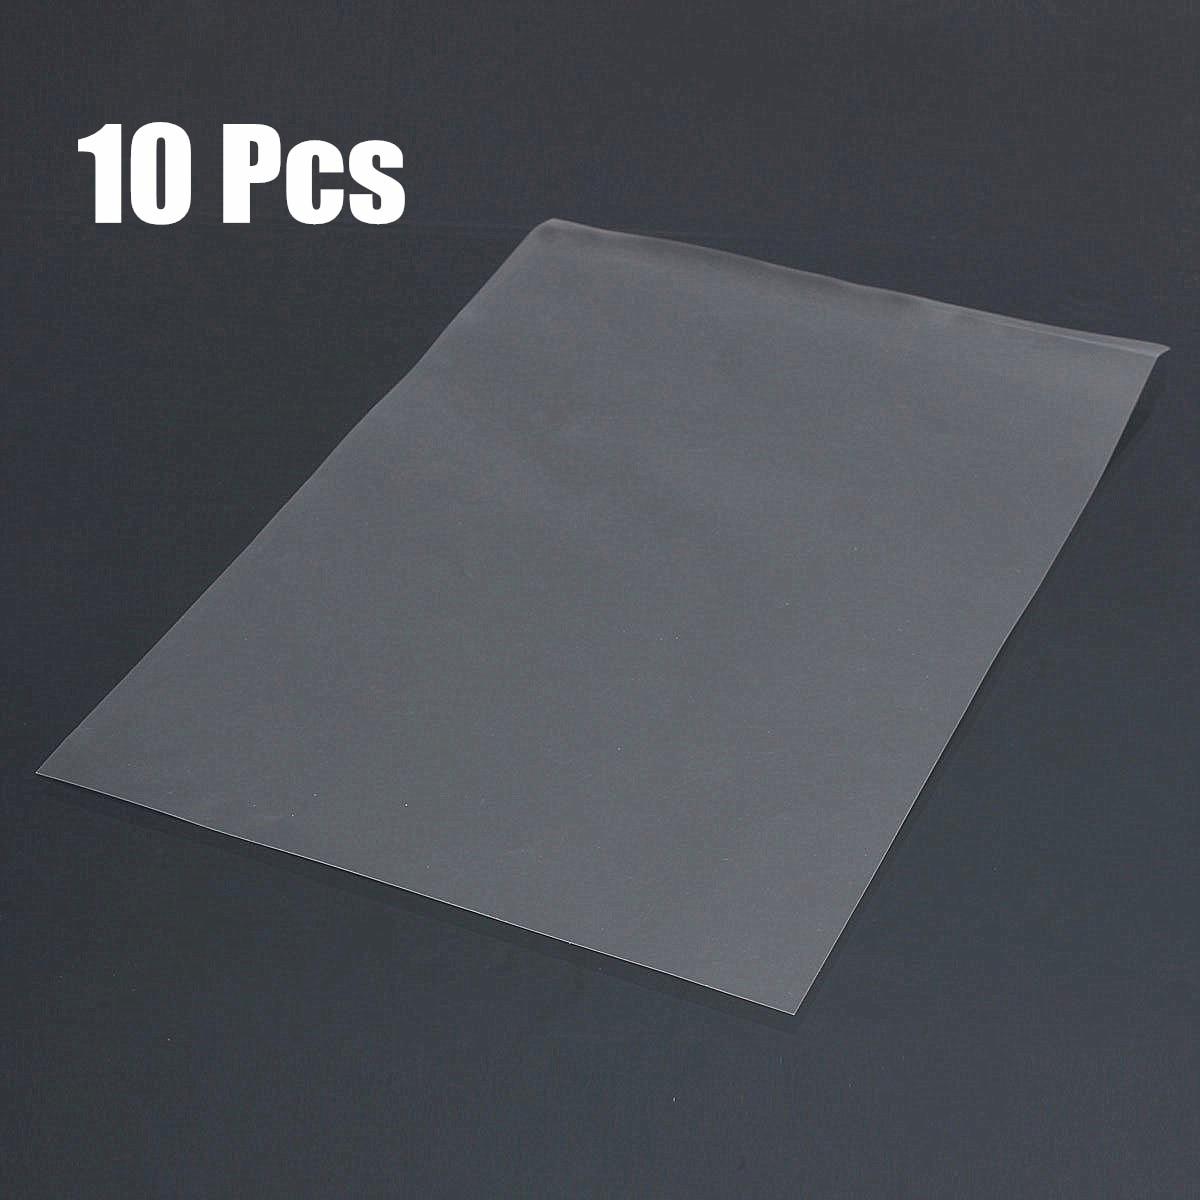 10pc A4 Transparency Film Paper for Inkjet Laser Printer DIY PCB Screen Printing